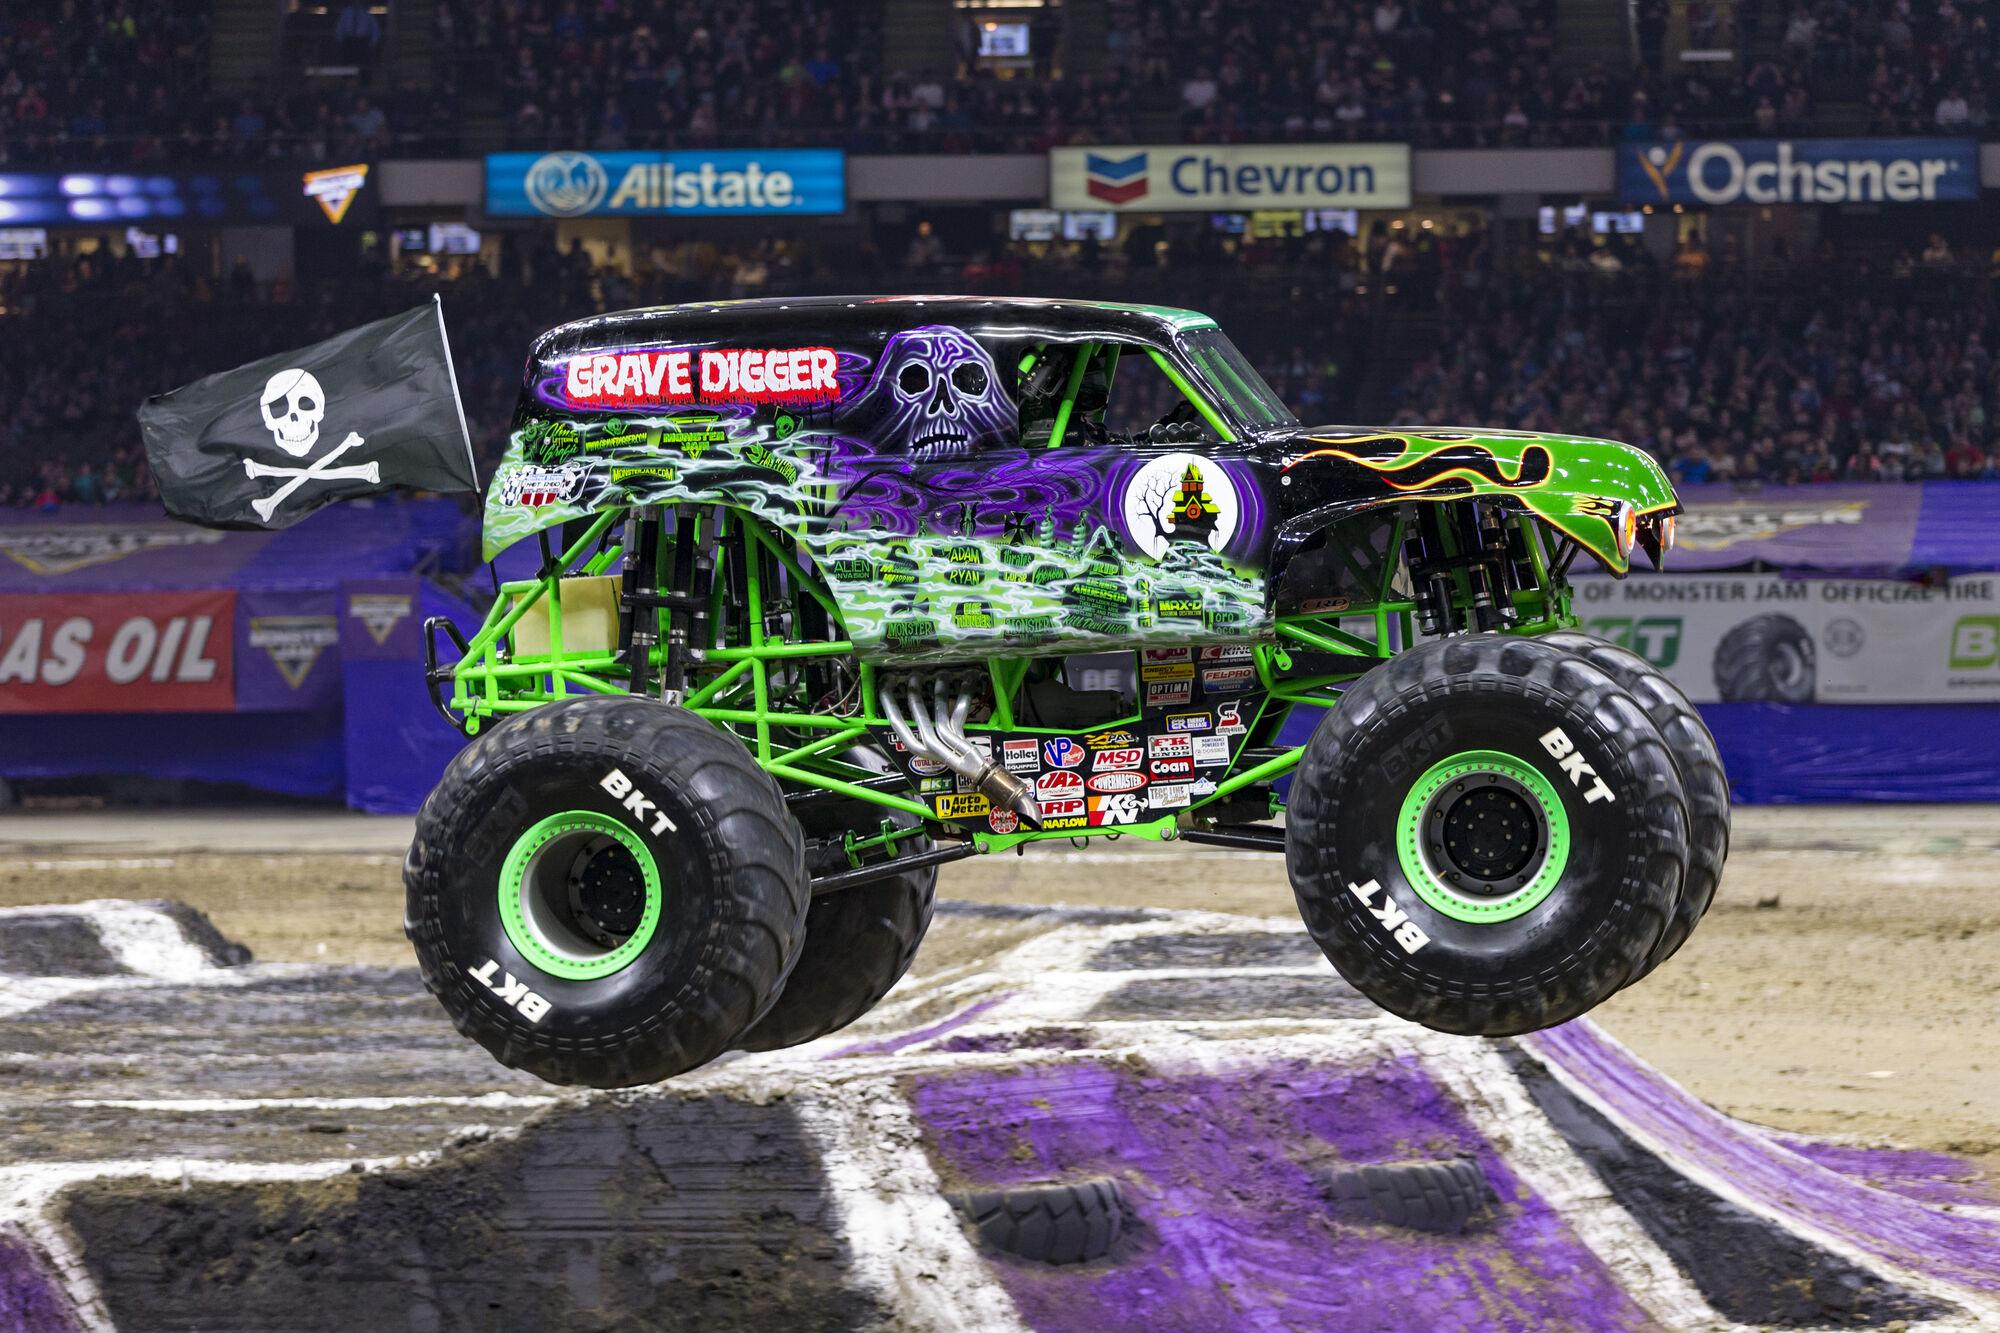 Grave Digger 33 Monster Trucks Wiki Fandom Powered By